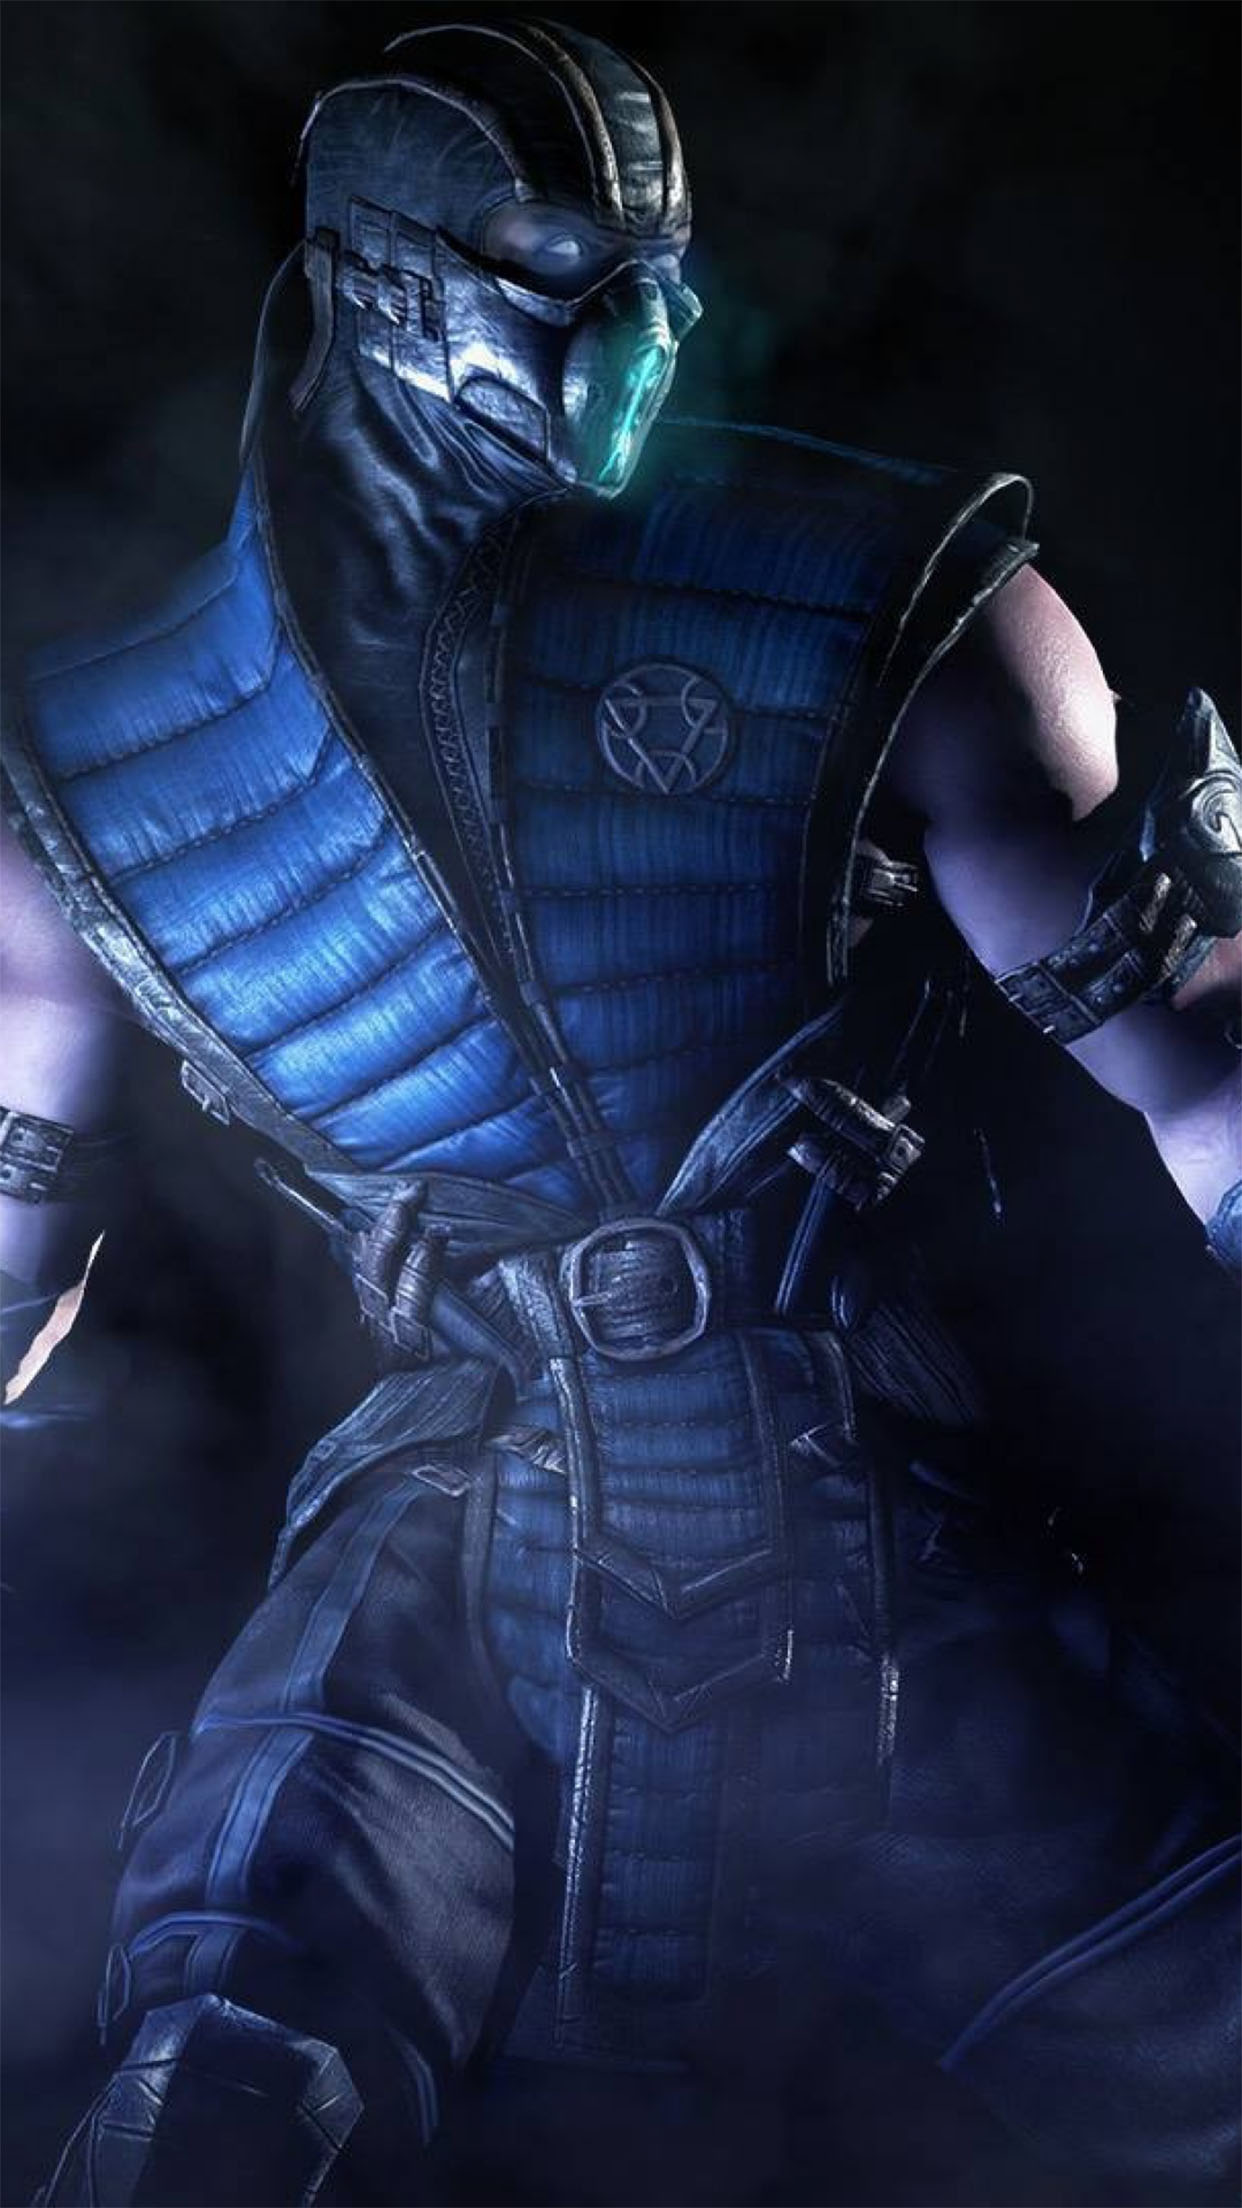 Mortal Kombat X Sub Zero 3Wallpapers iPhone Parallax Sub Zero